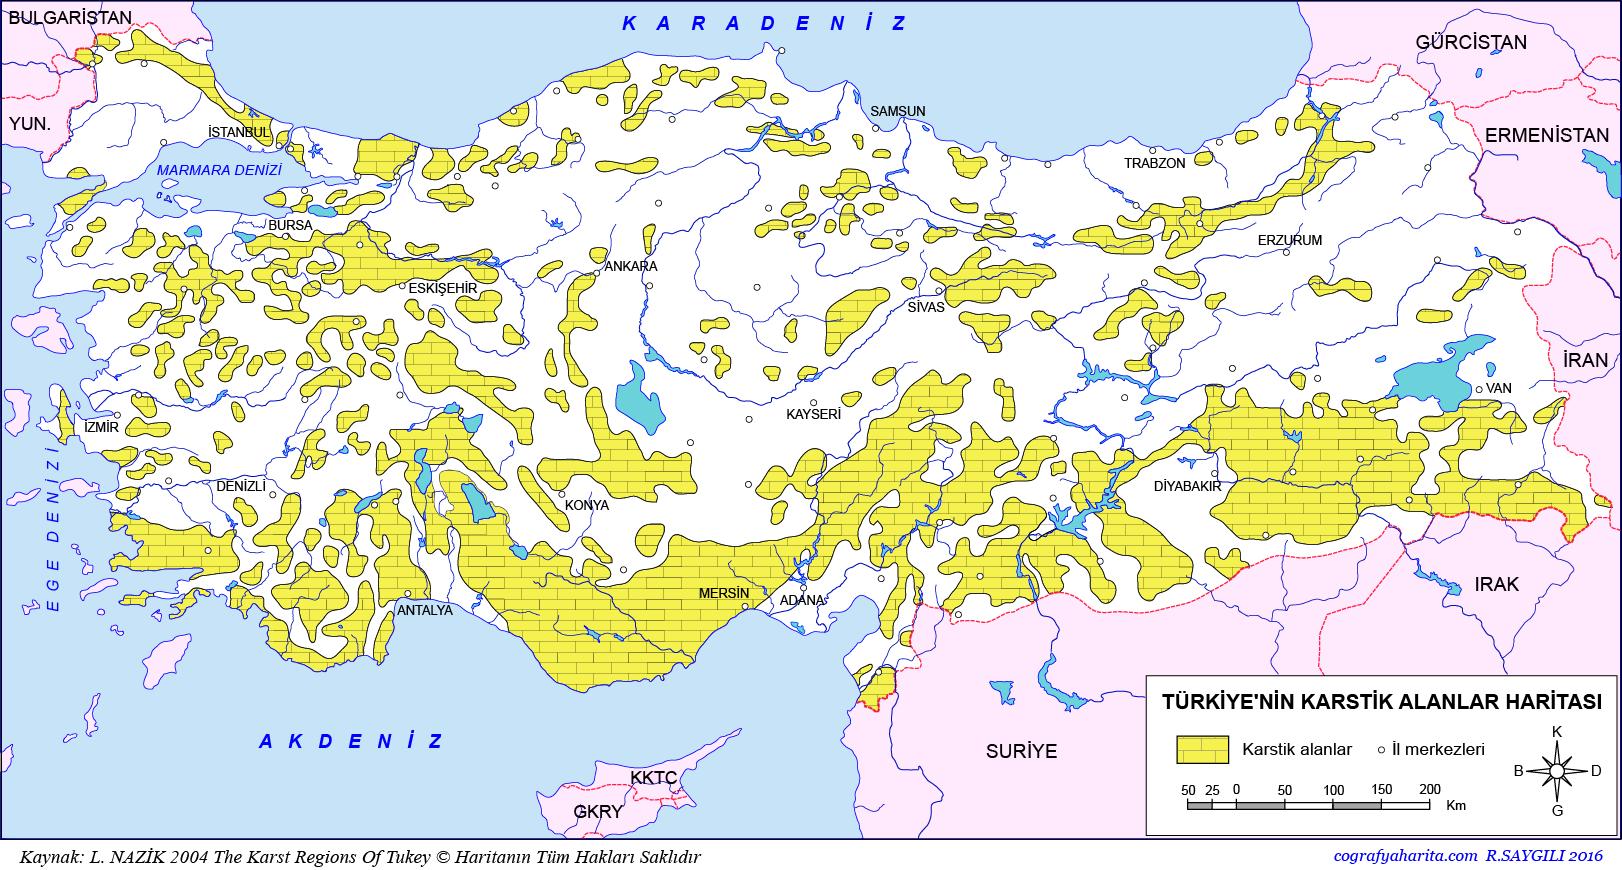 1050 x 525 png 410kB. cografyahocam.com. cografya-turkiye-karstik-alanlar-haritasi-1050x525.png 06-May-2017 17.